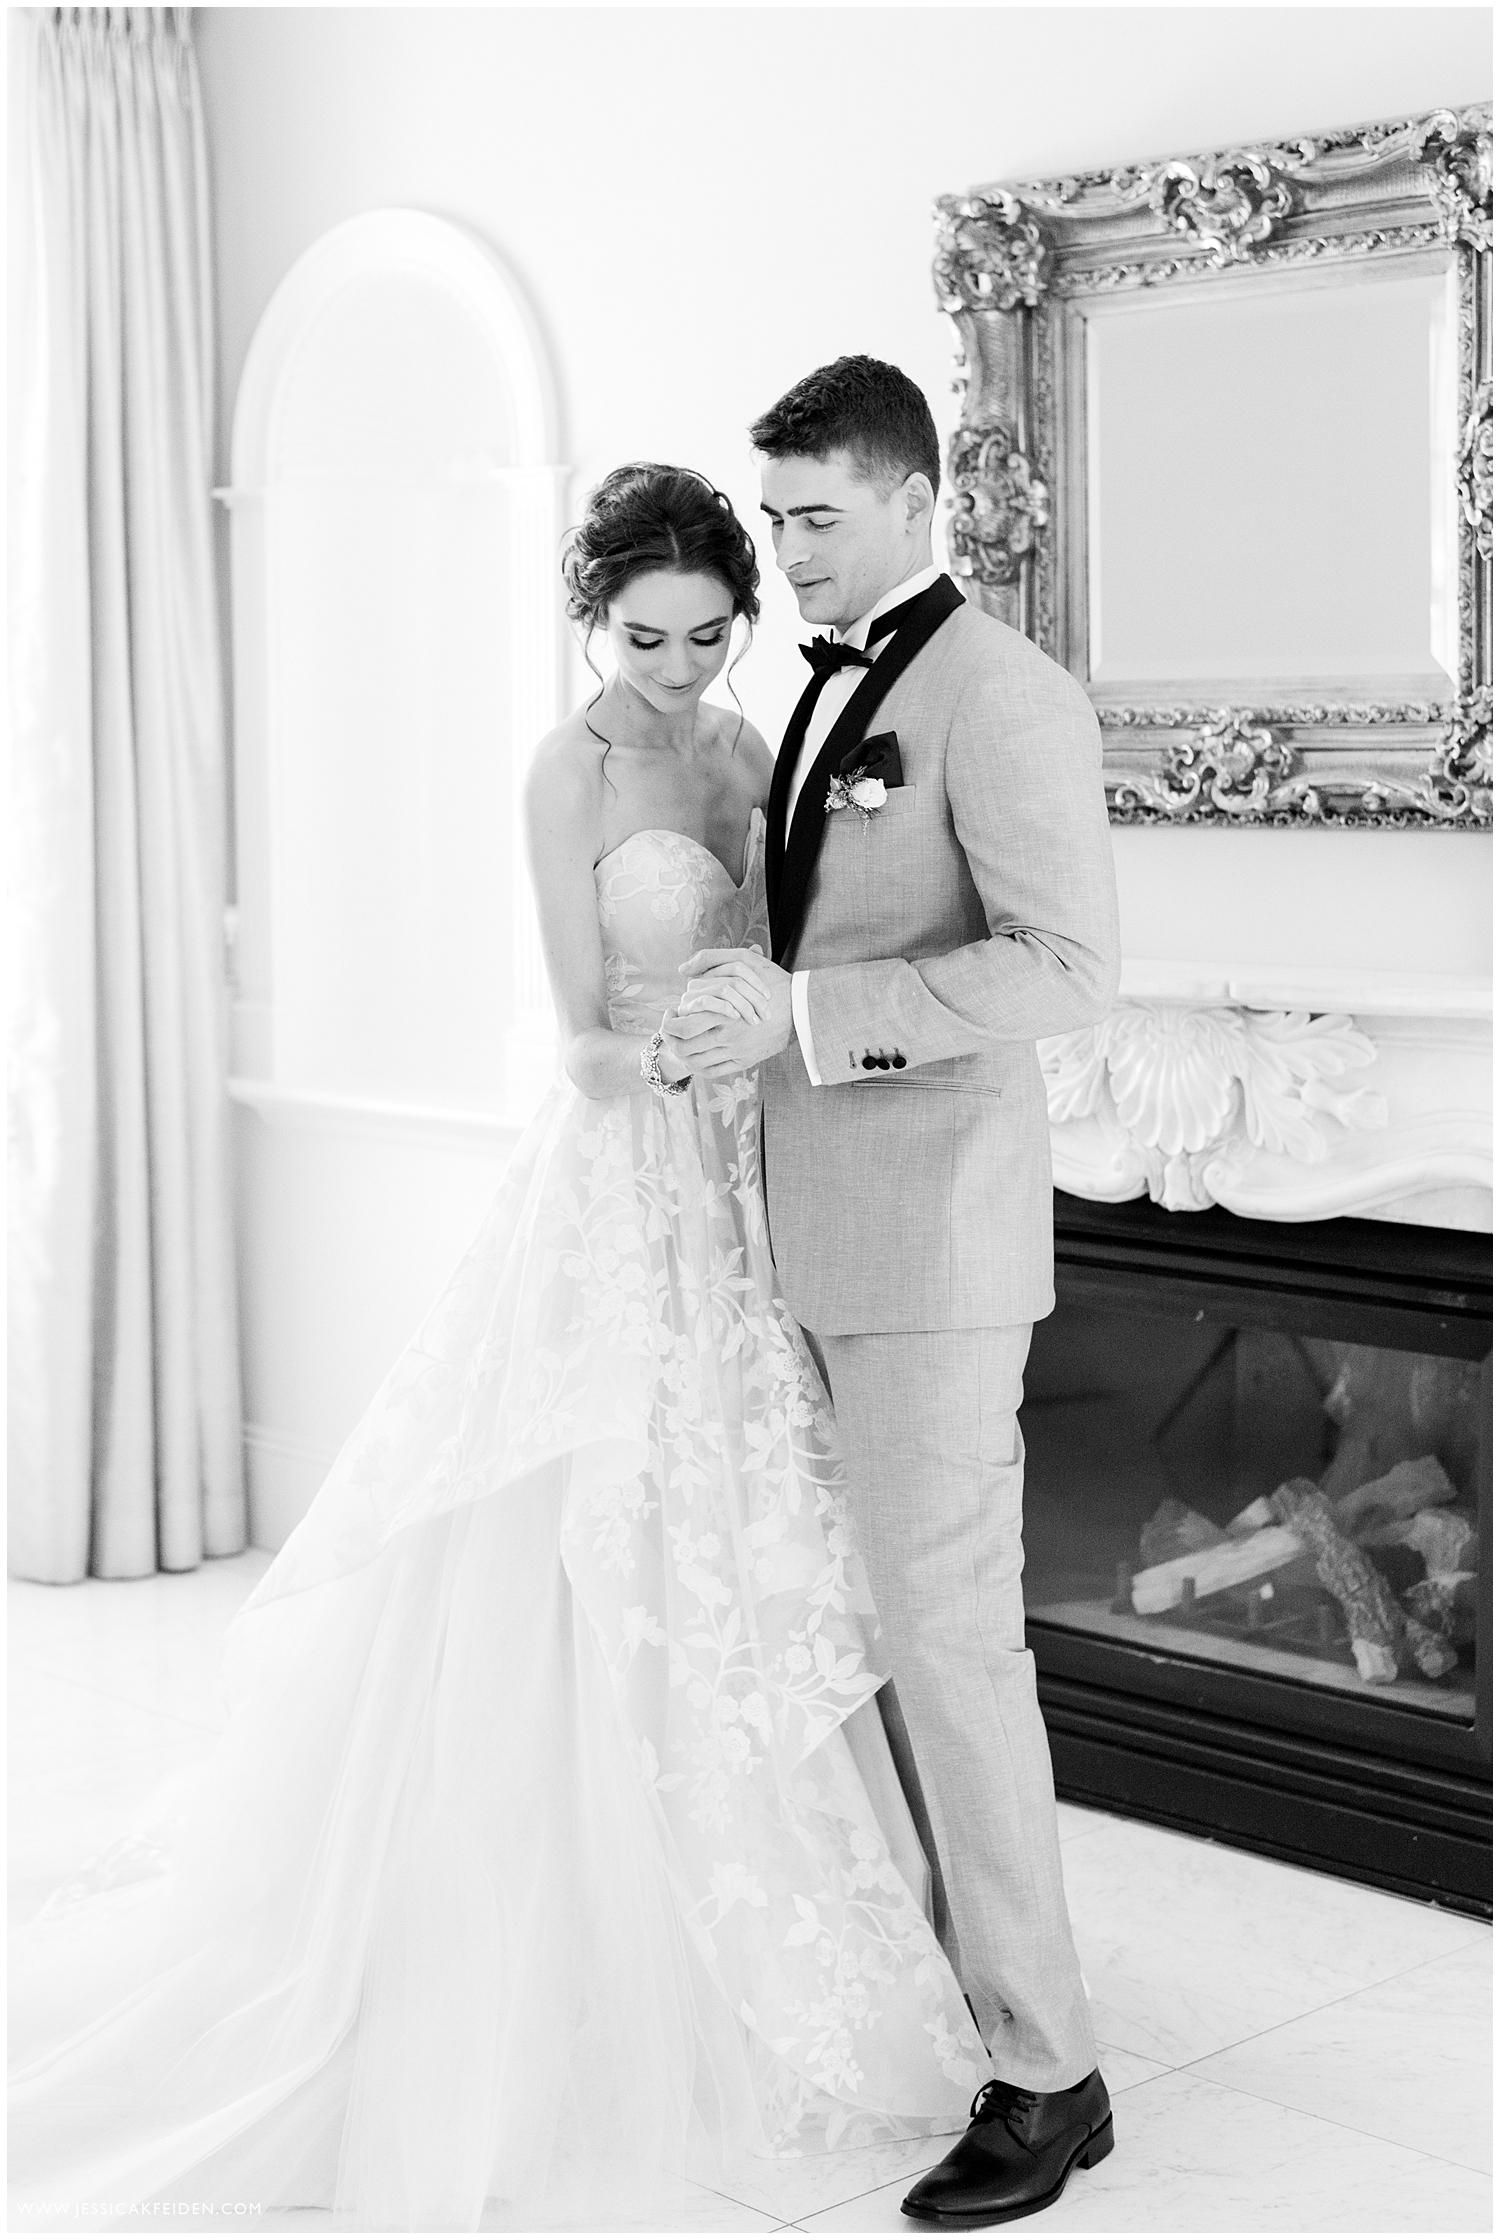 Jessica K Feiden Photography_The Commons 1854 Topsfield Wedding Photographer_0042.jpg